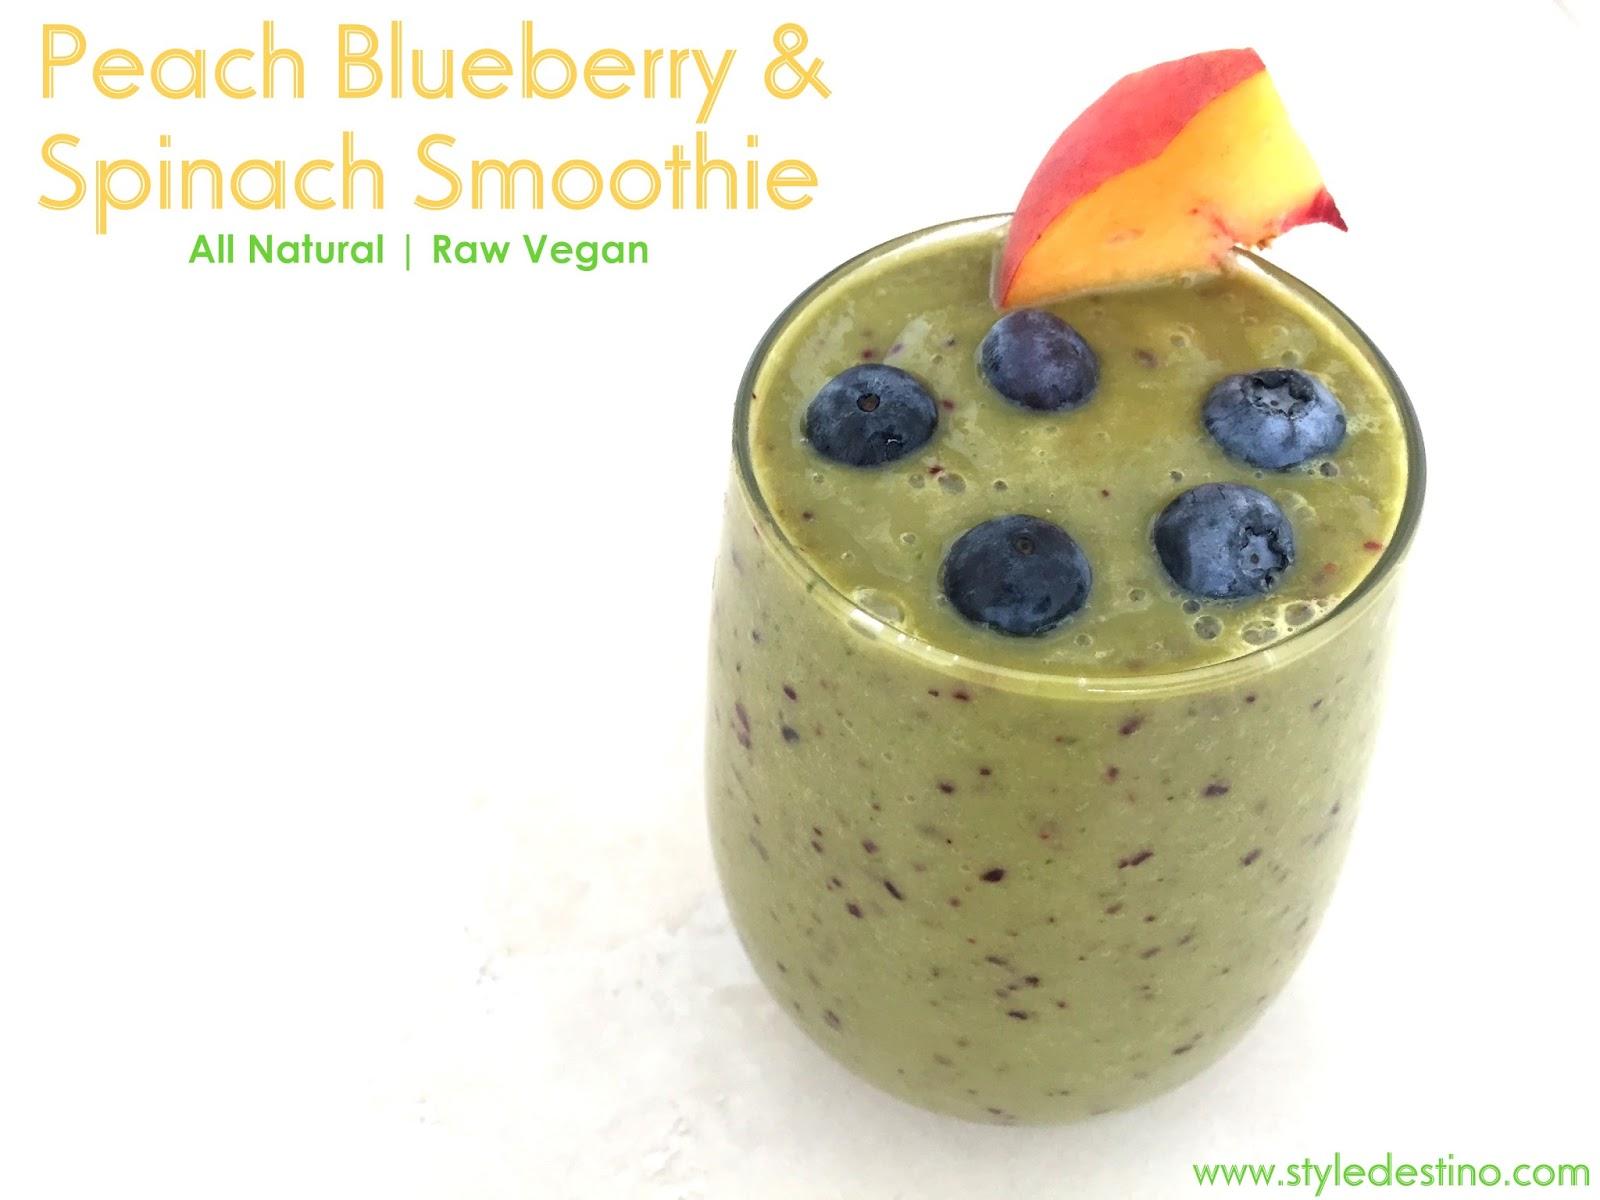 Healthy skin peach blueberry spinach smoothie style destino healthy skin peach blueberry spinach smoothie forumfinder Choice Image